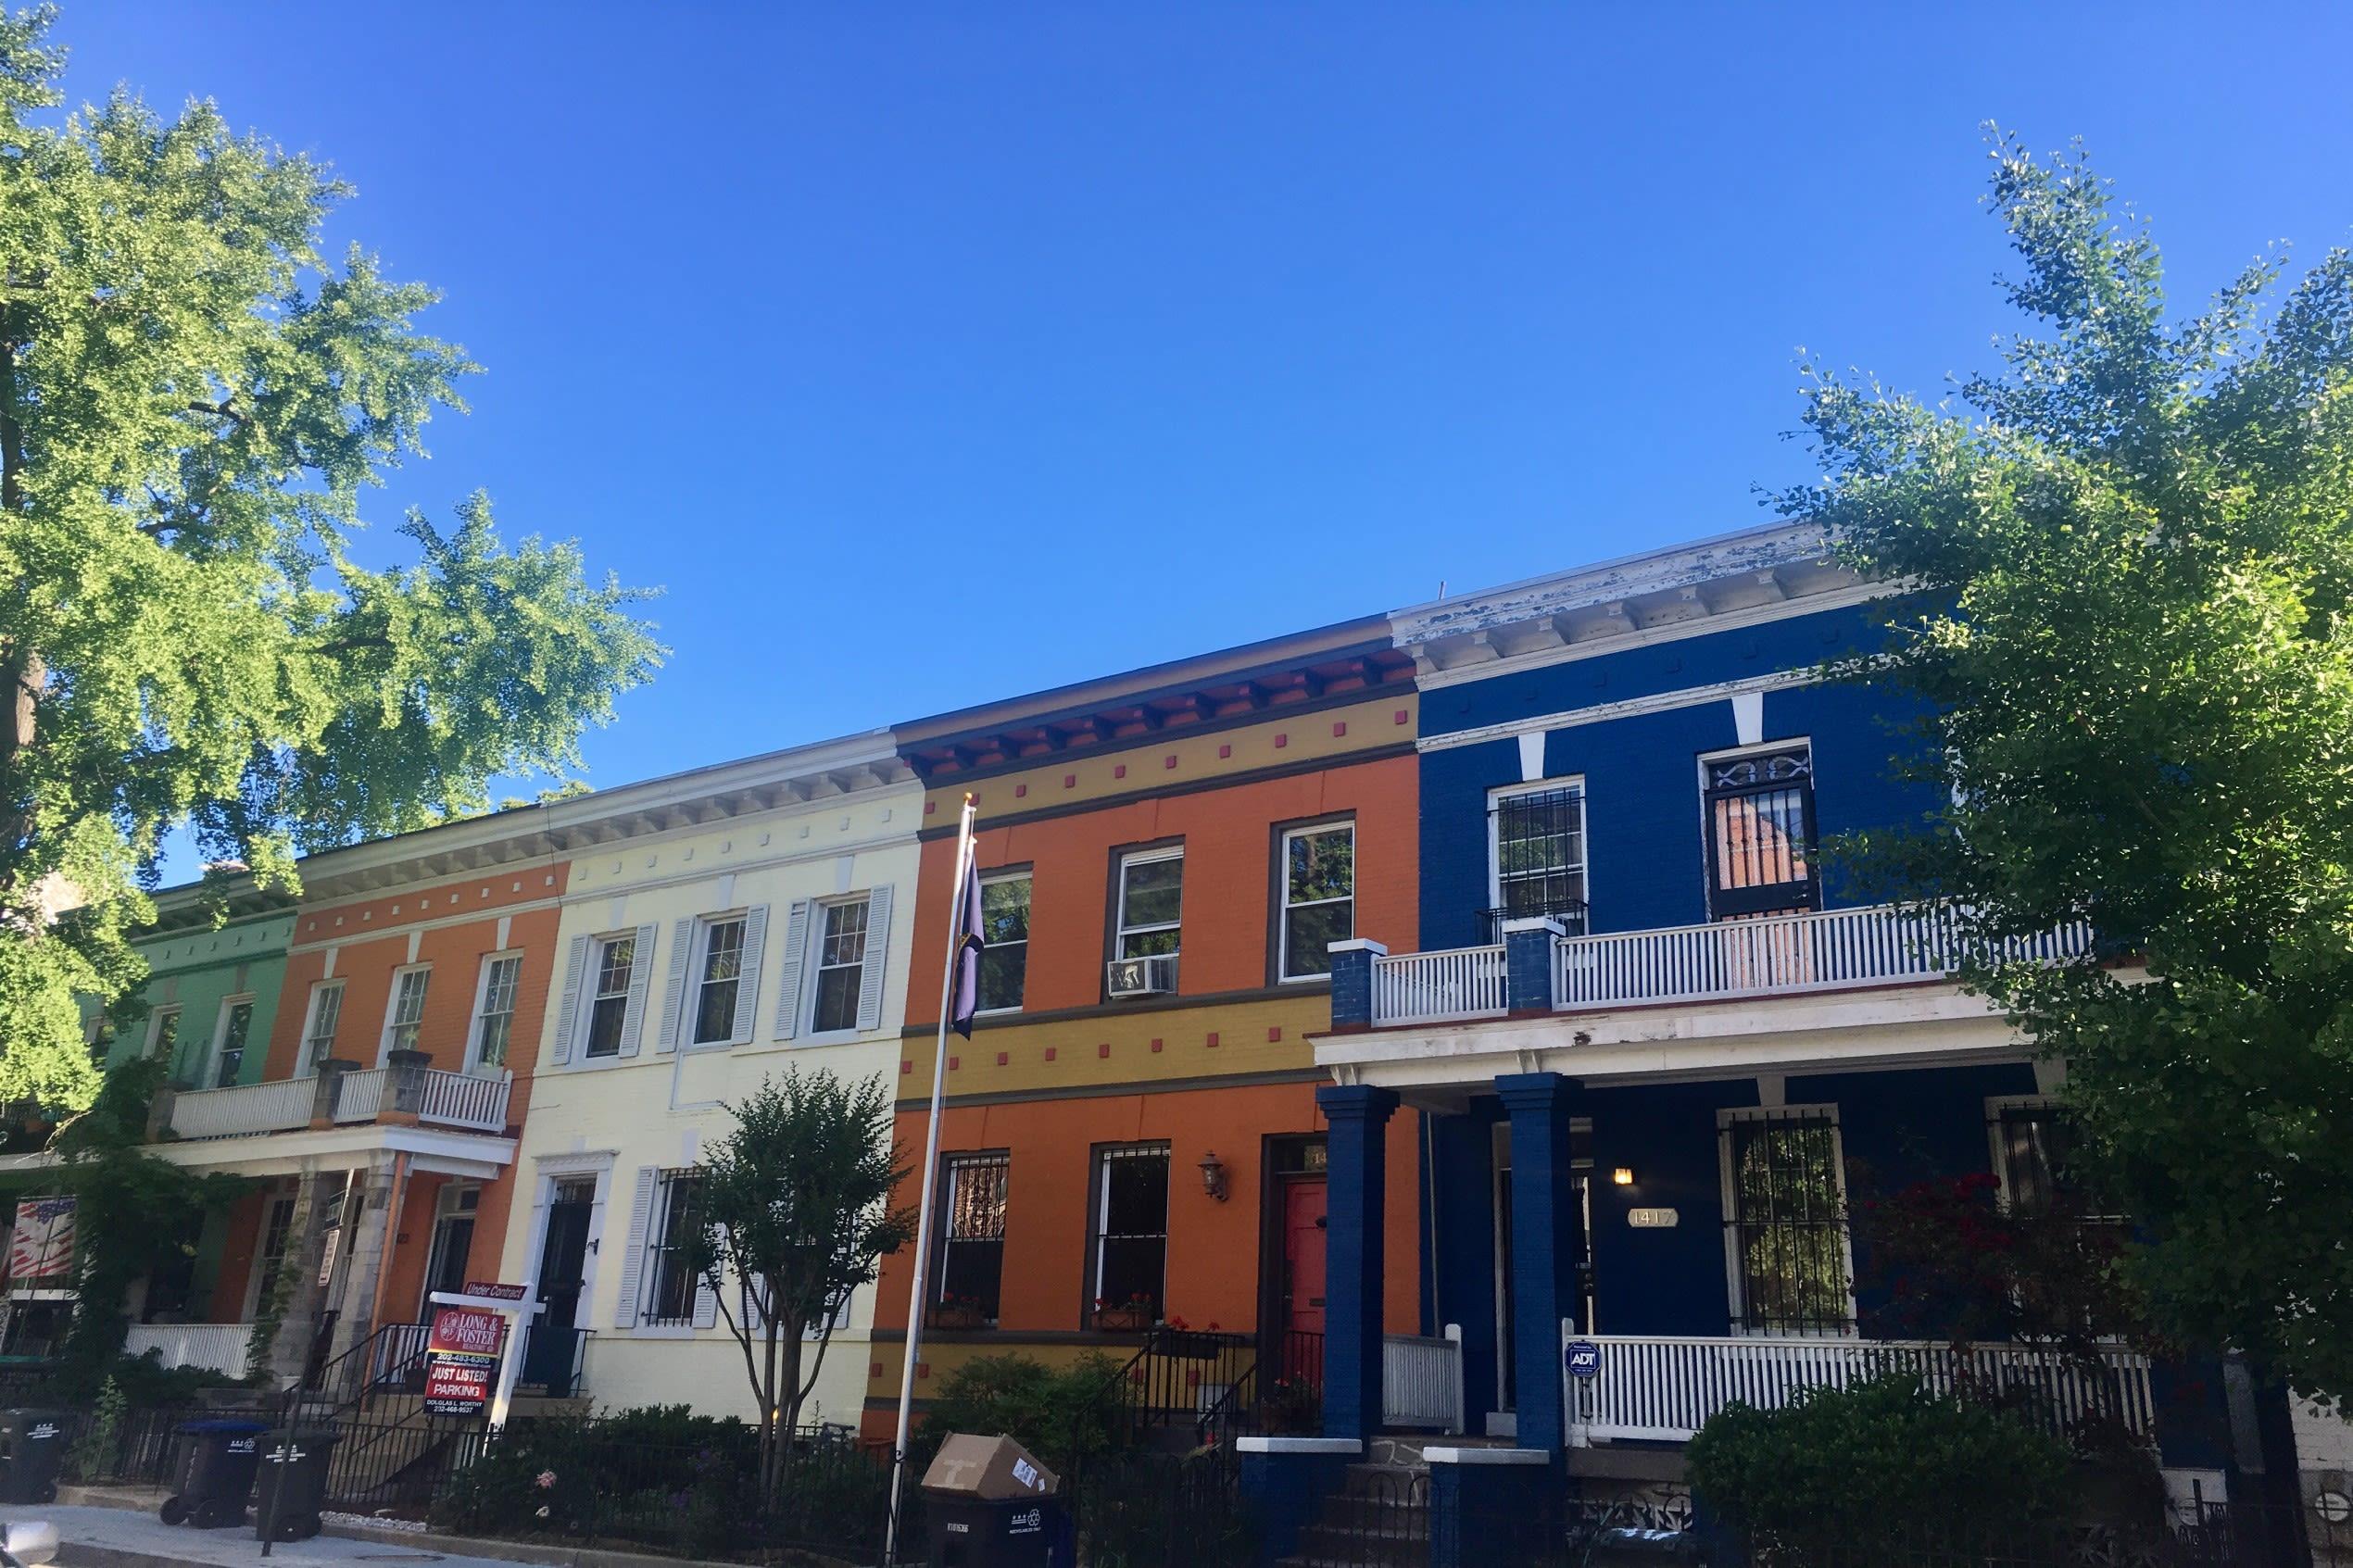 A street scene of Columbia Heights in Washington DC